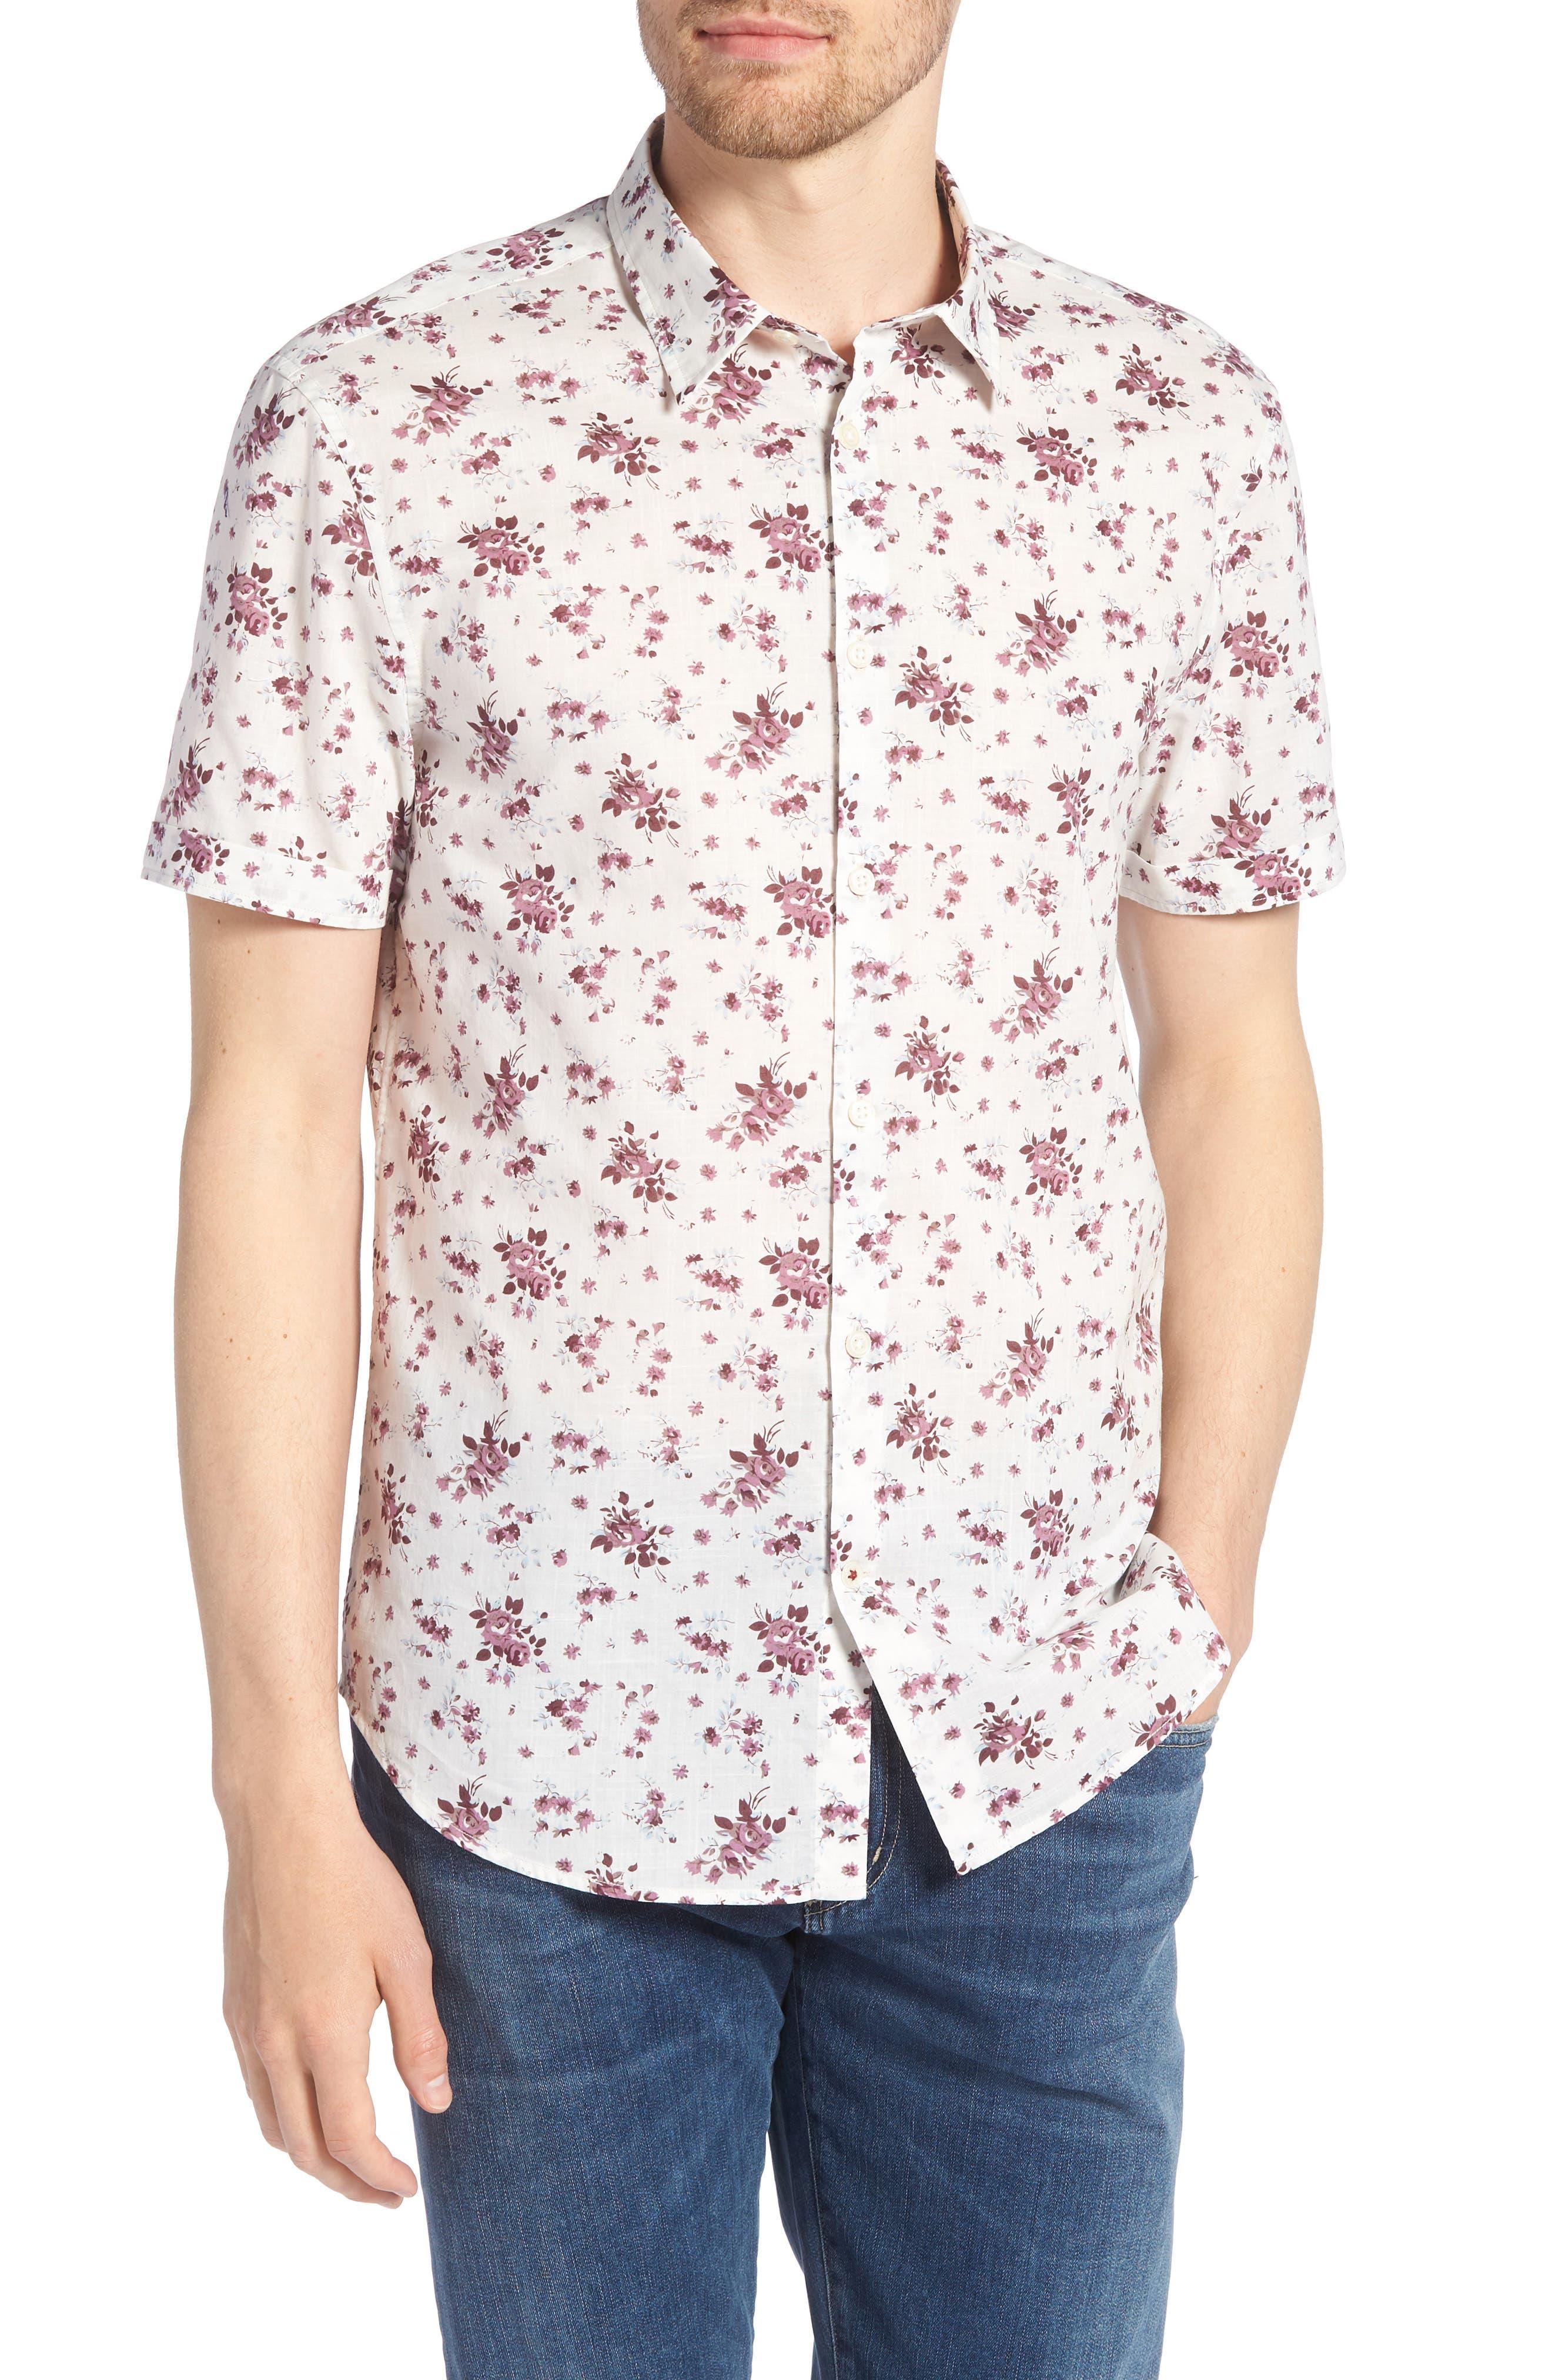 Regular Fit Floral Woven Shirt,                         Main,                         color, ANTIQUE ROSE